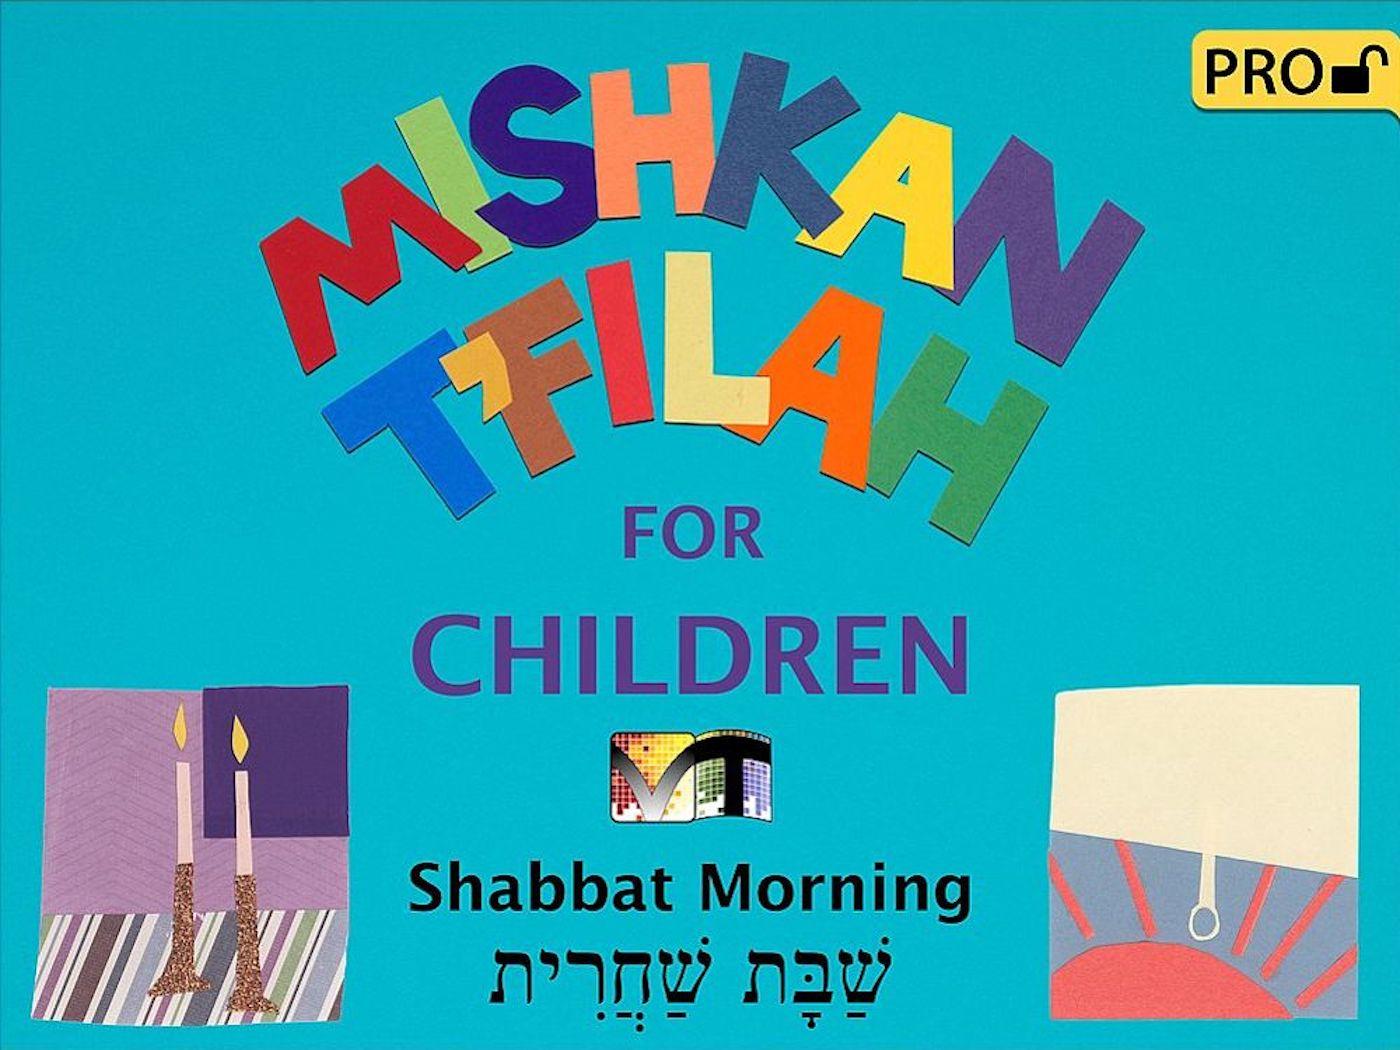 Mishkan T'filah for Children Visual T'filah (Shabbat Morn Pro)